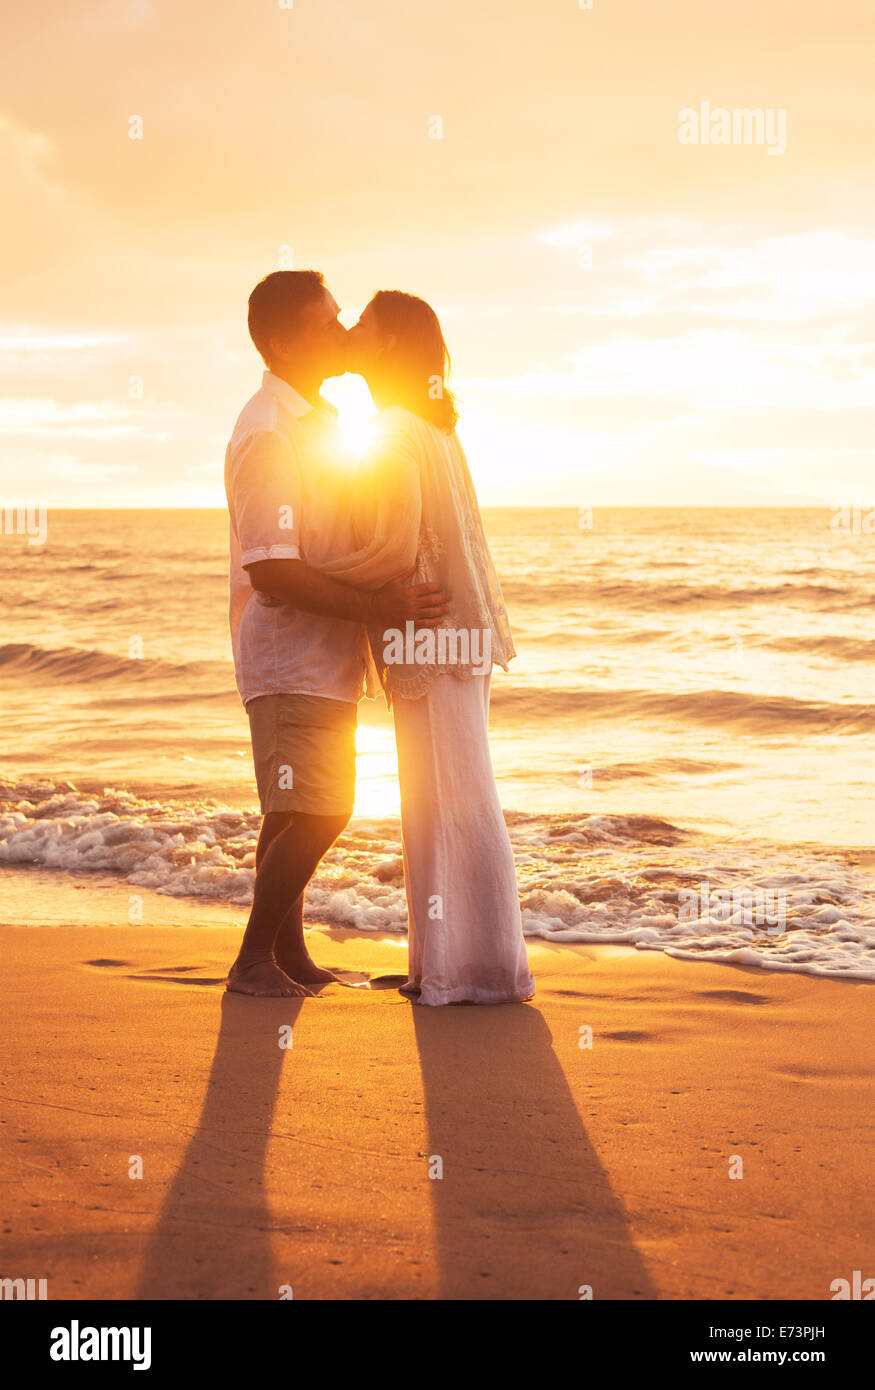 Romantische älteres Paar küssen bei Sonnenuntergang am Strand Stockbild